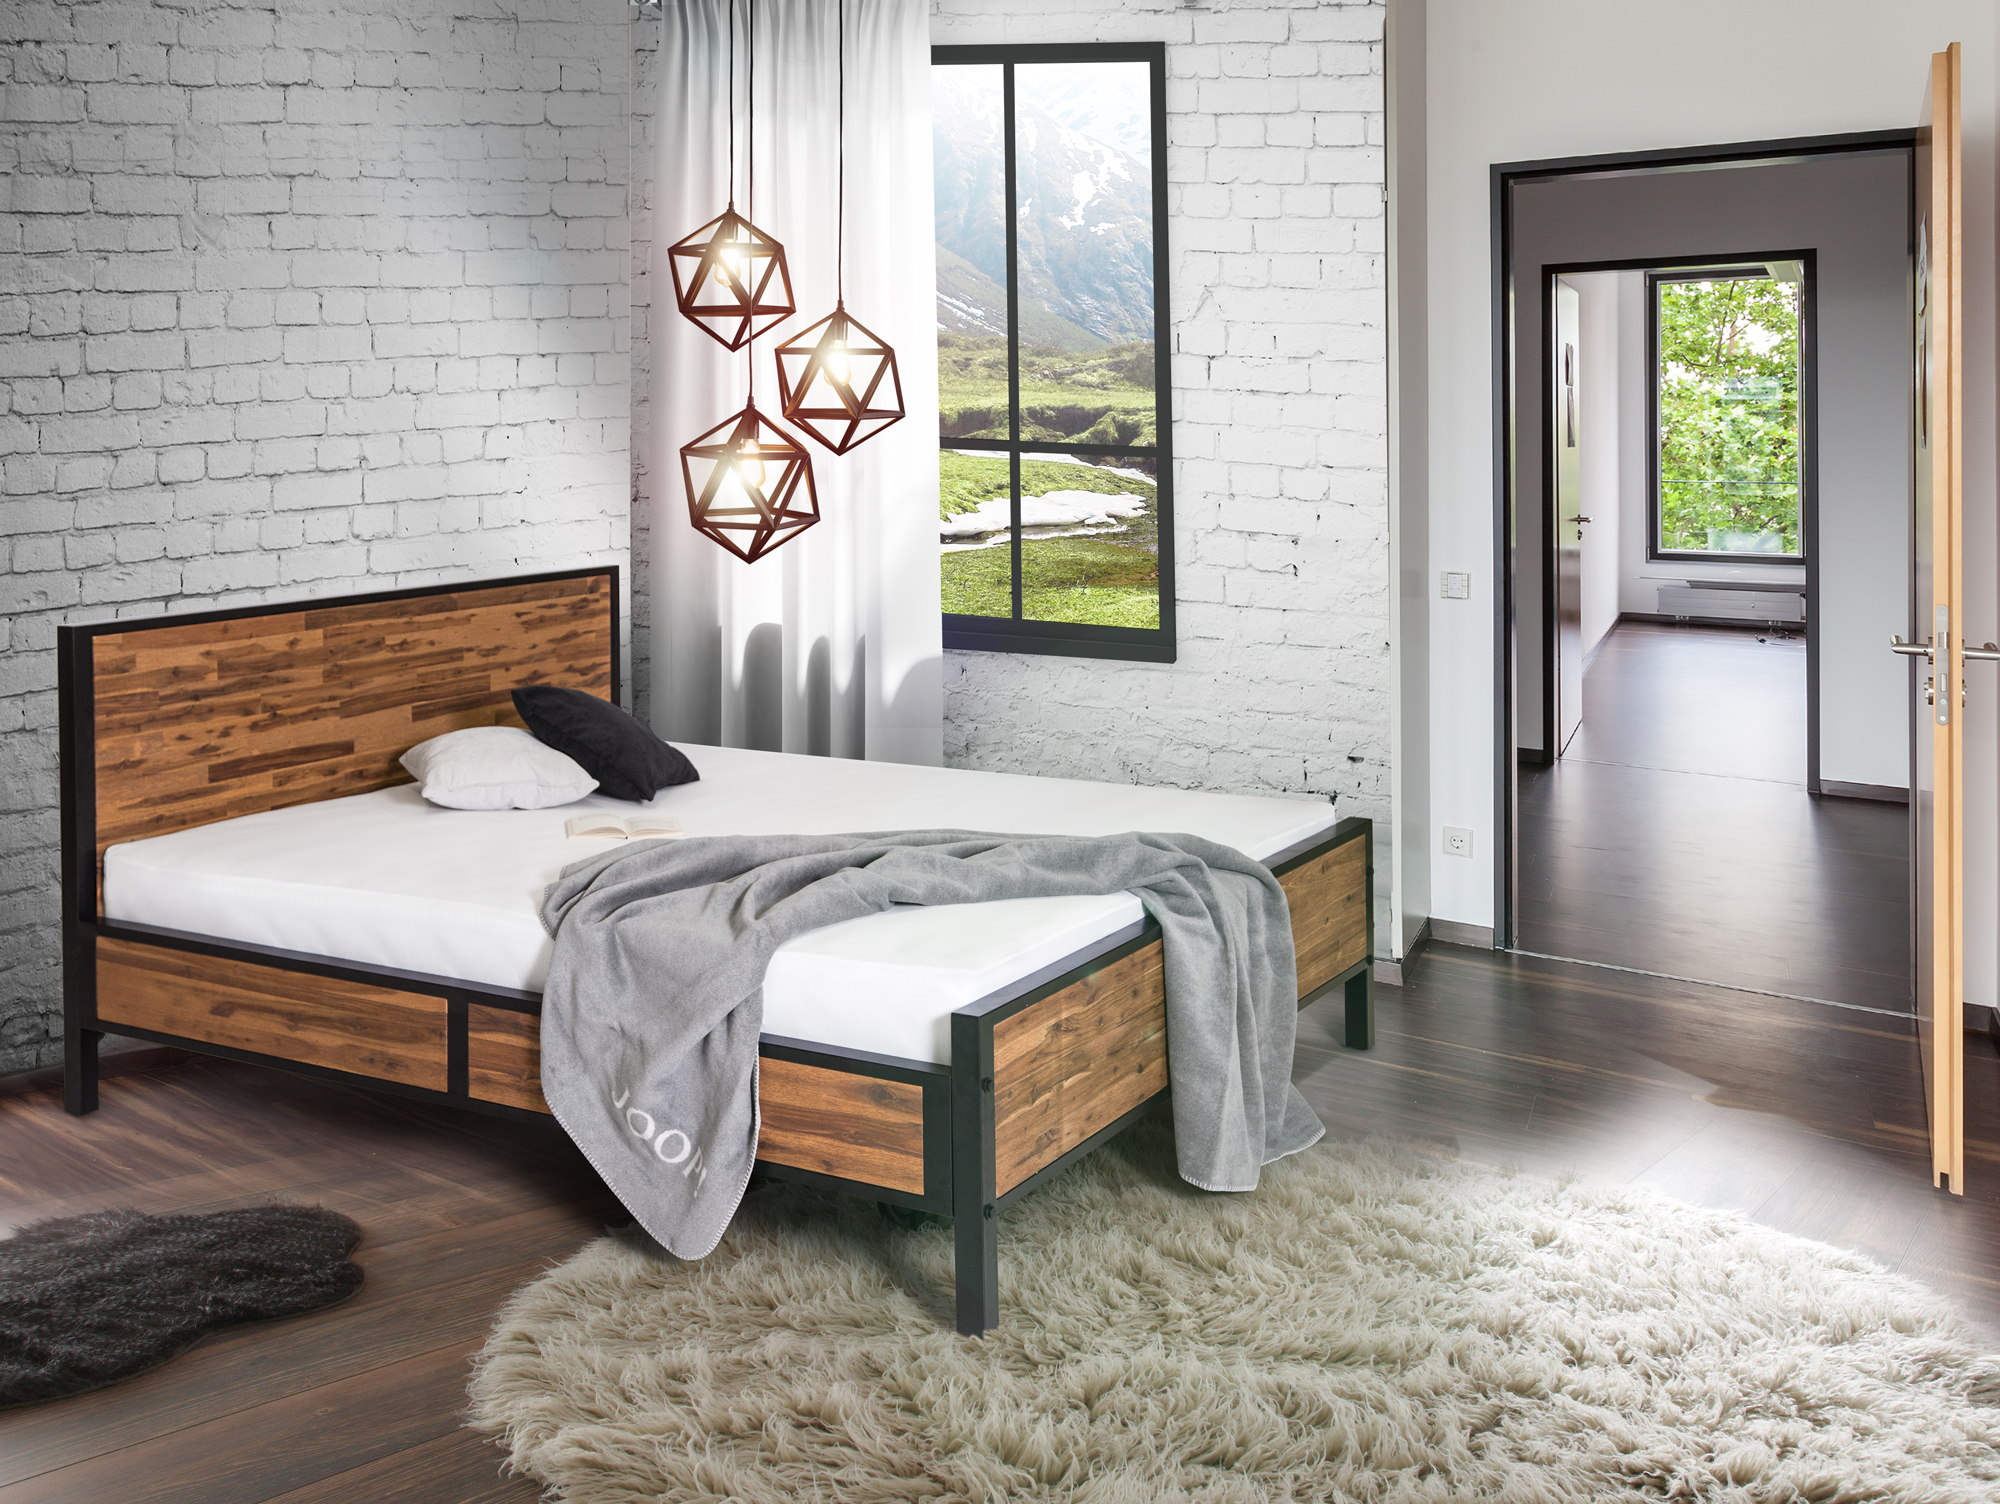 industrial massivholzbett 160 x 200 cm. Black Bedroom Furniture Sets. Home Design Ideas